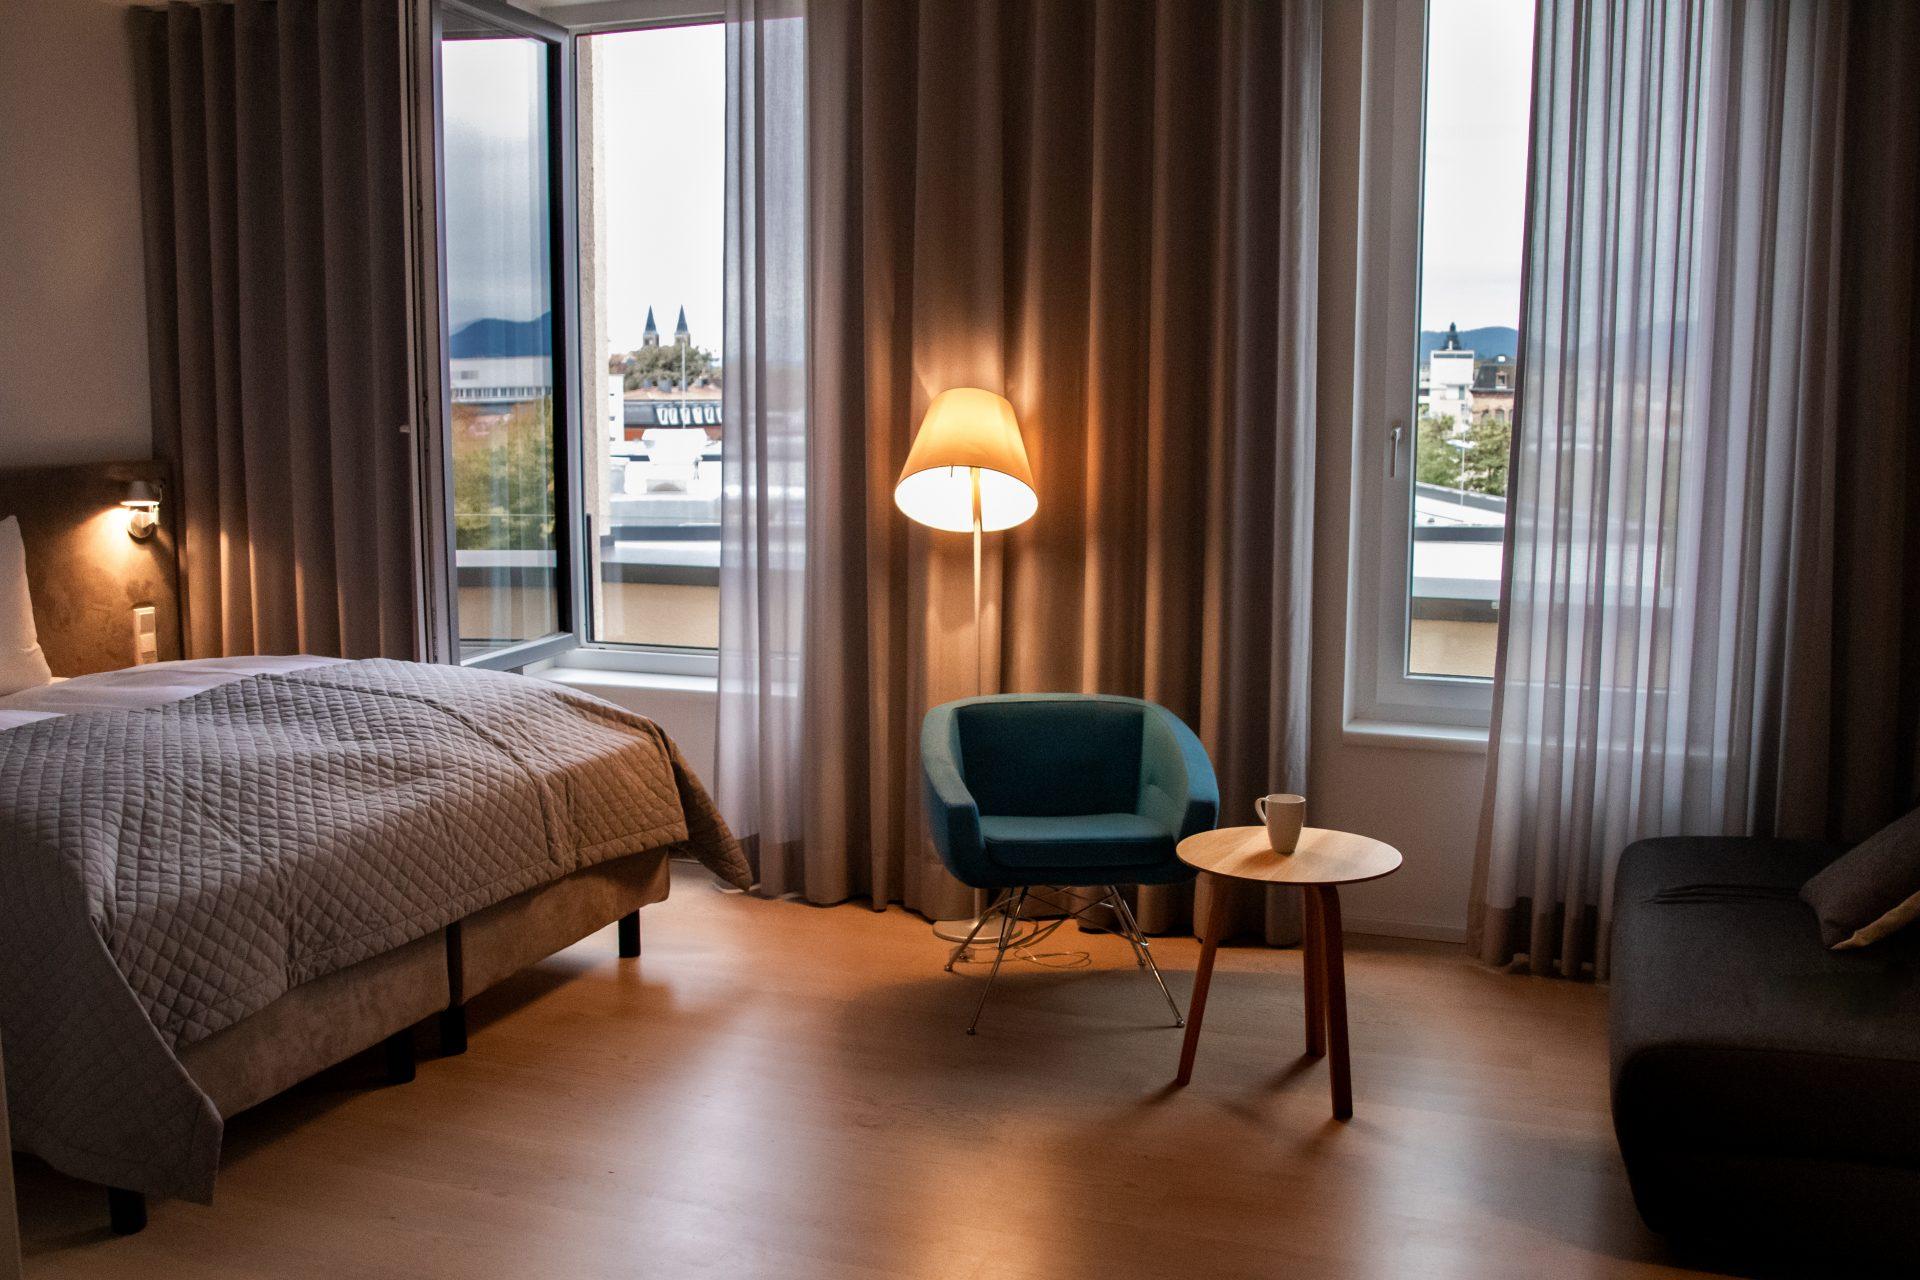 maximilians-boutique-hotel-ausblick